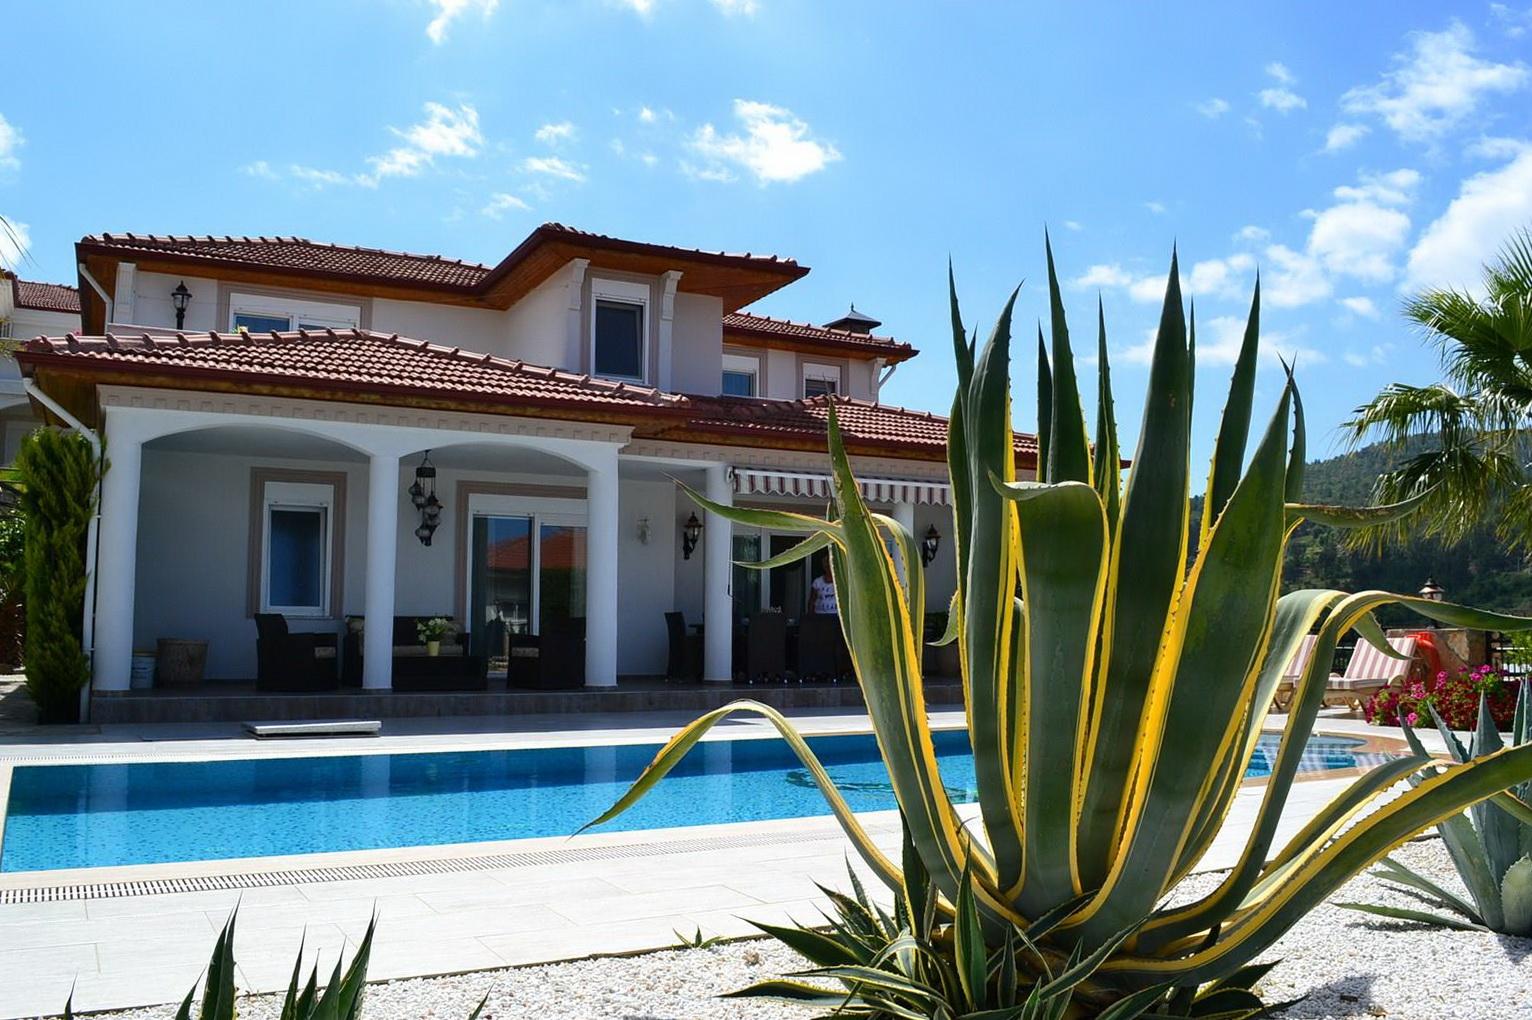 Villa Lux Kargıcak Alanya — Продажа виллы в Аланье (Каргыджак)